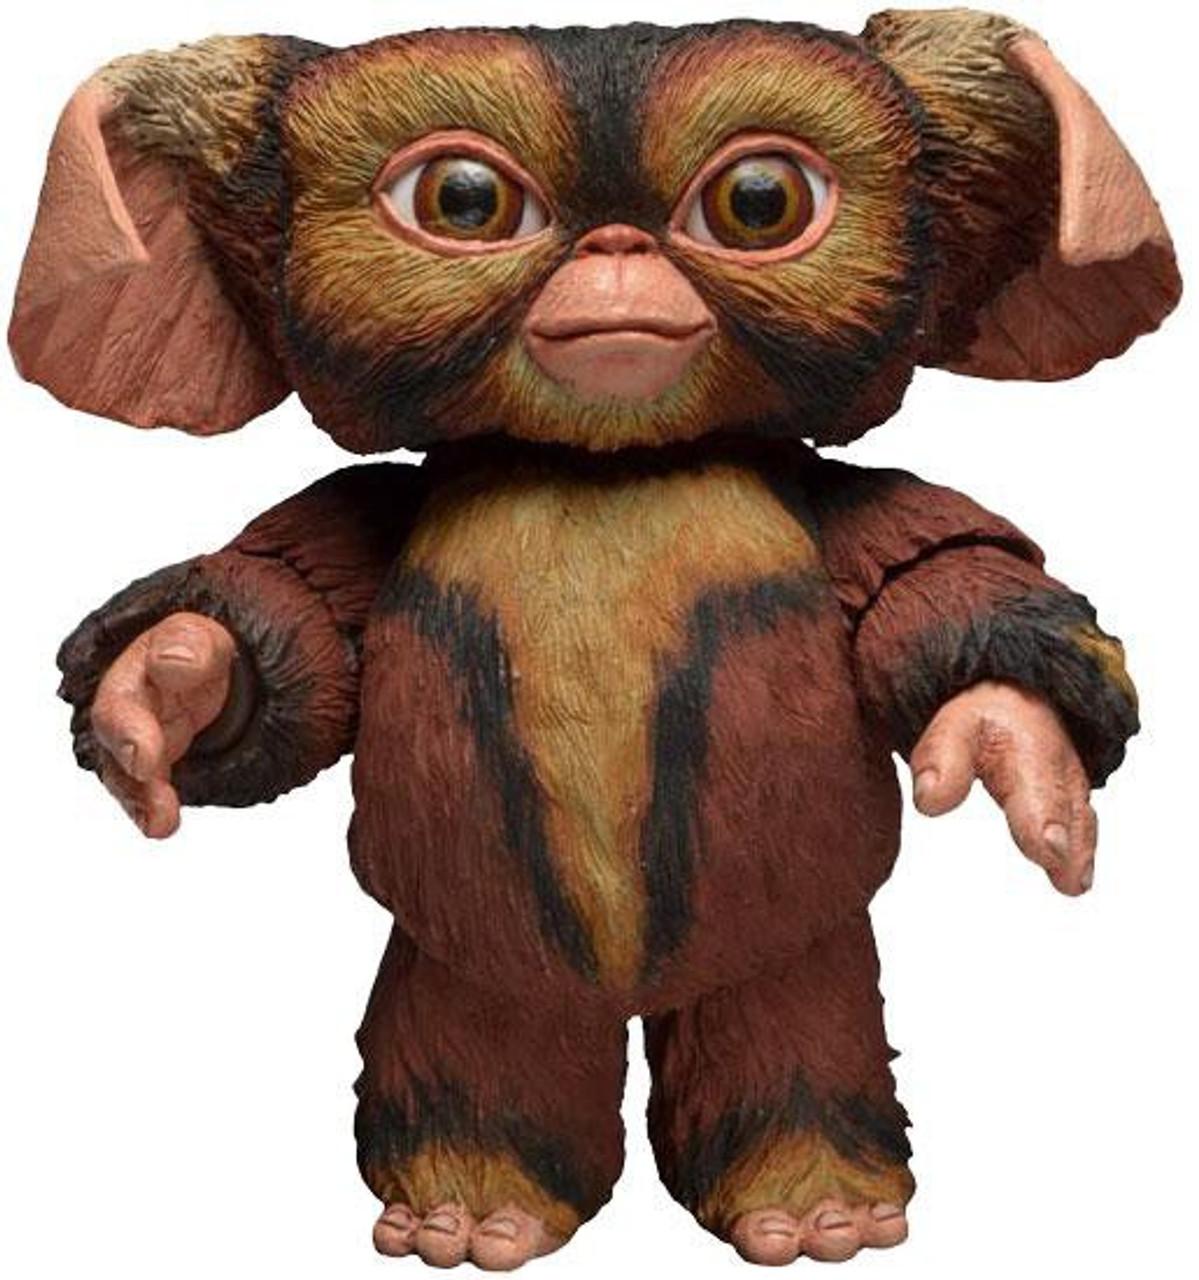 NECA Gremlins Mogwais Series 4 Brownie Action Figure